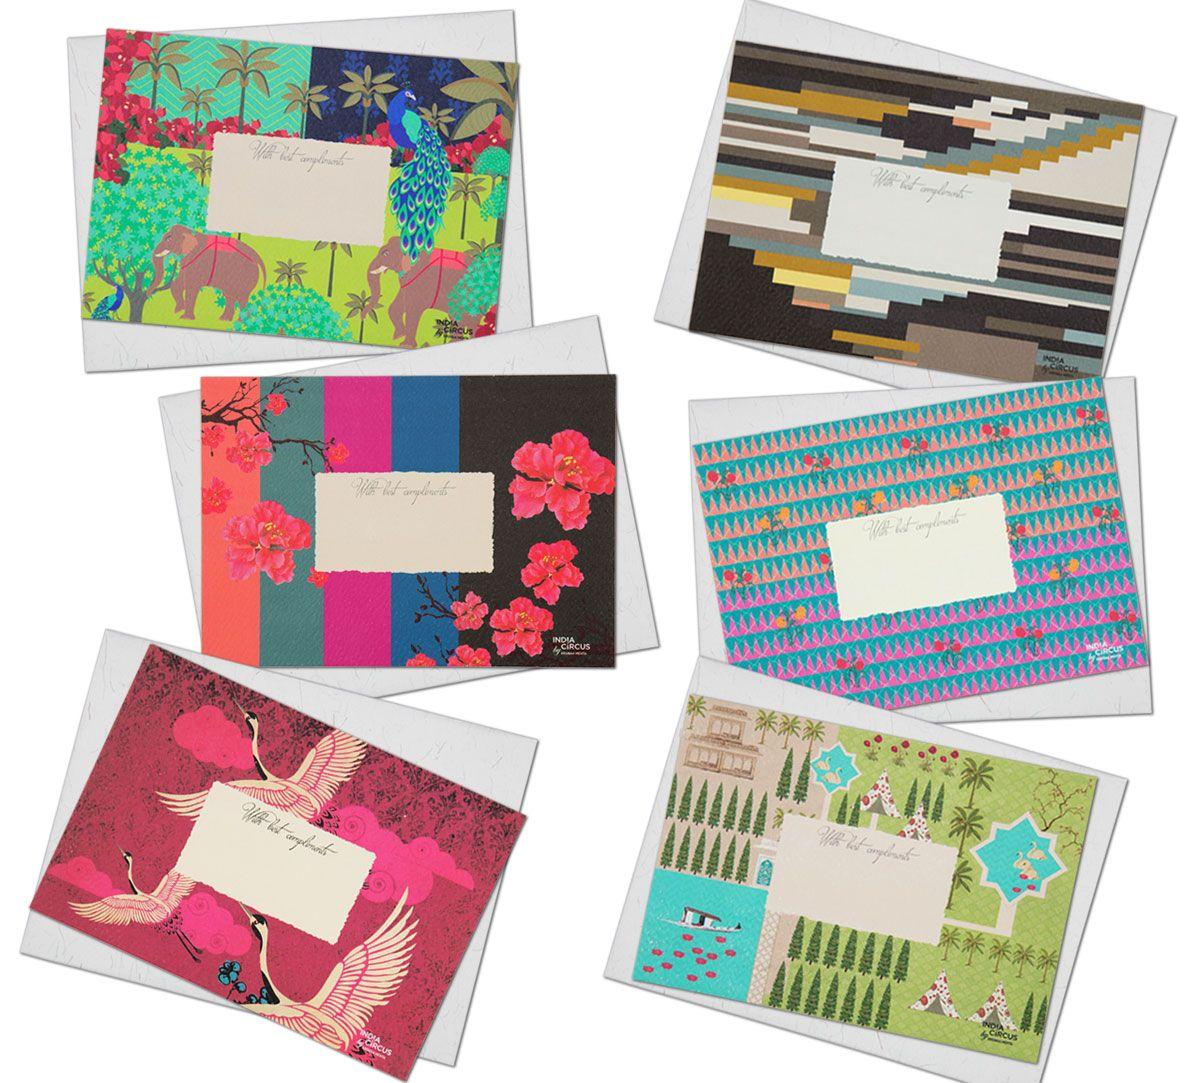 Forest Serenade Gift Cards (Set of 6)